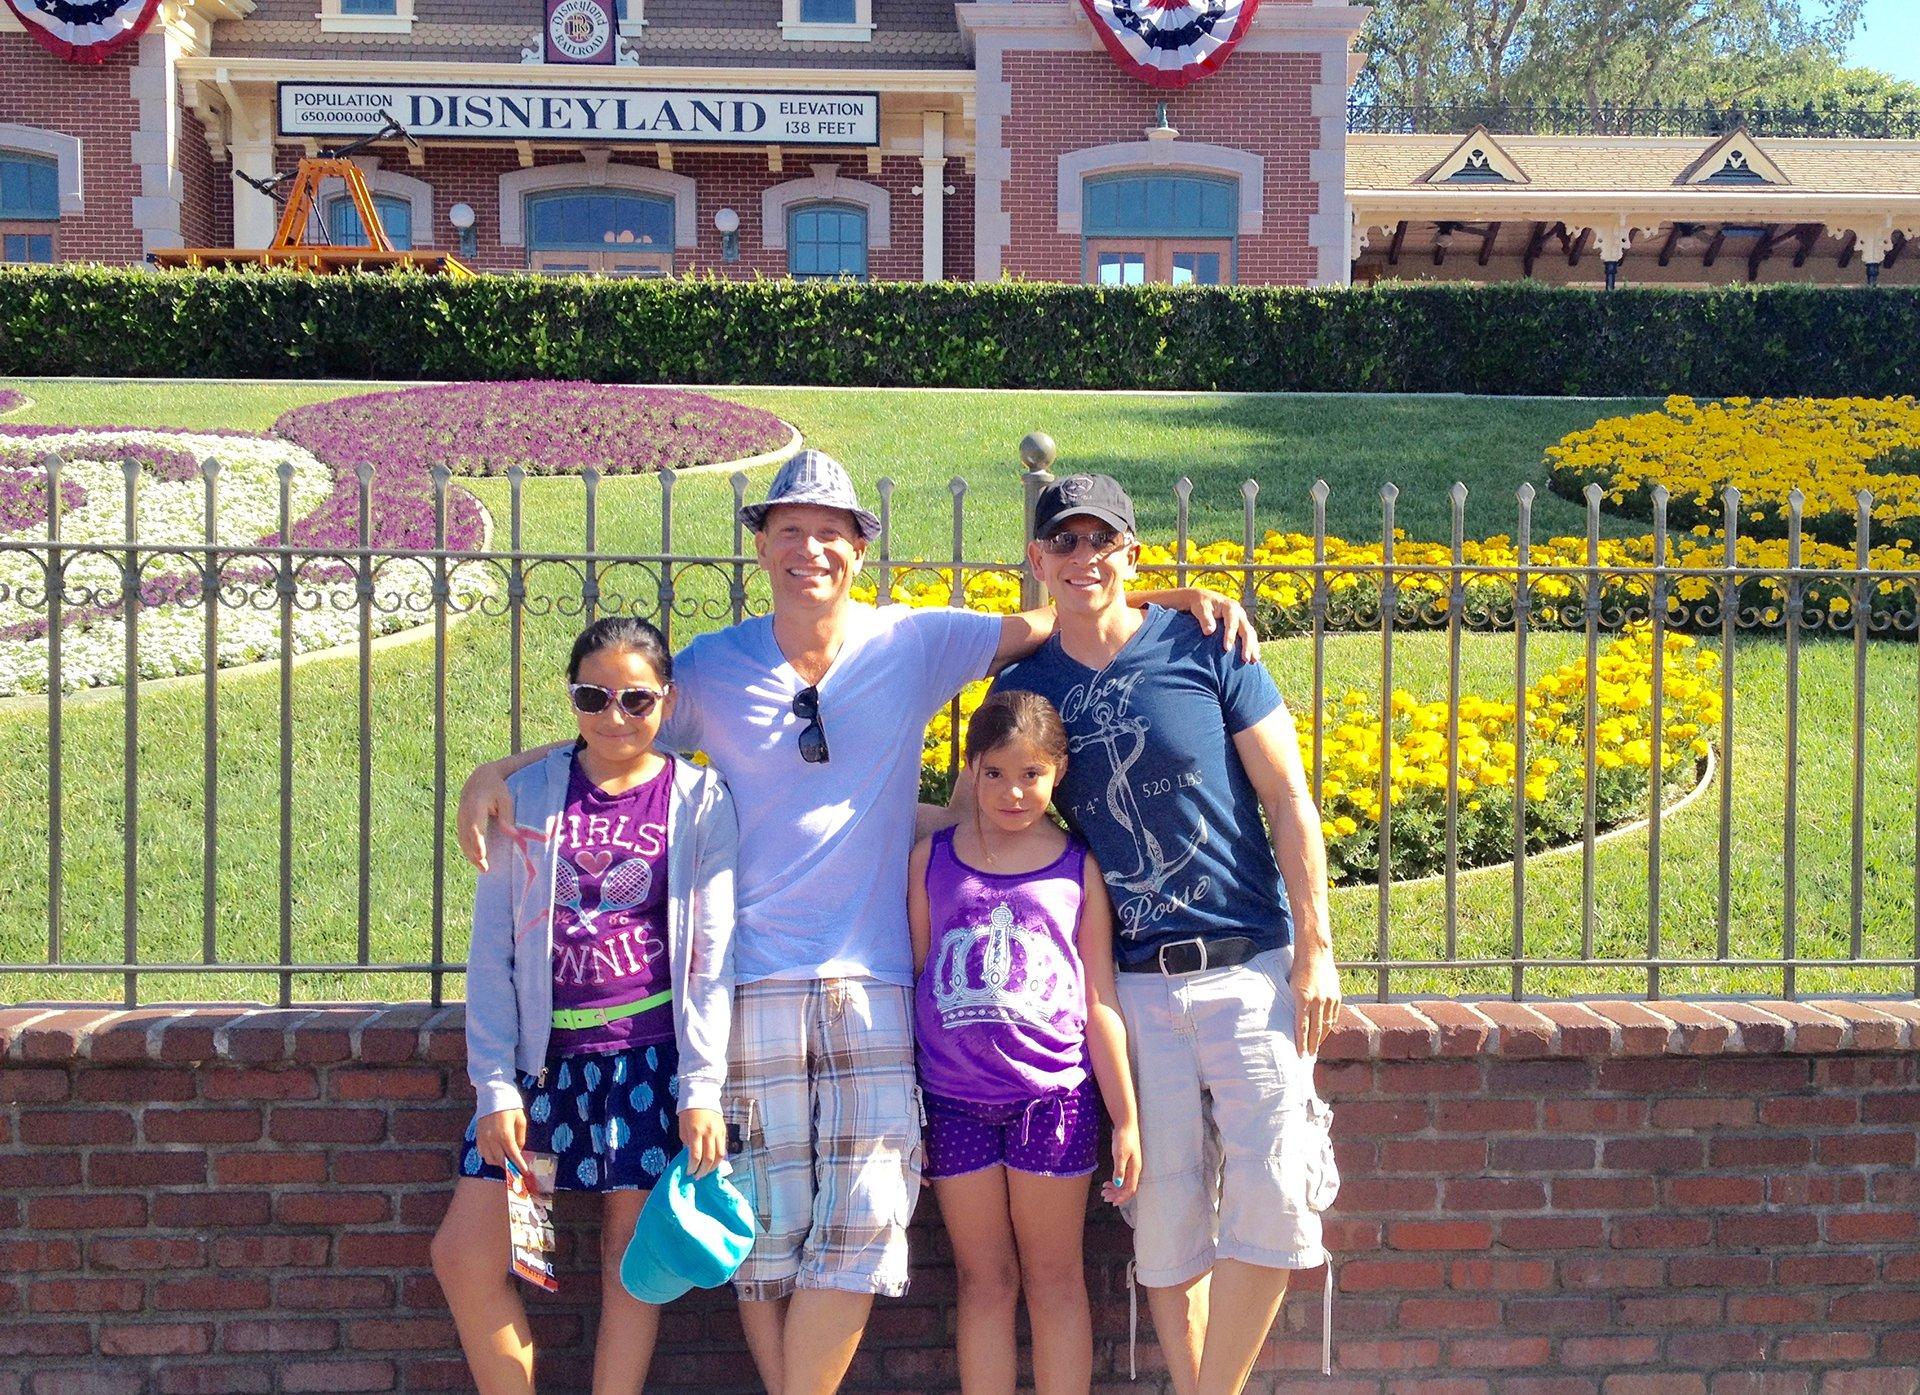 Disneyland: A Necessary Evil